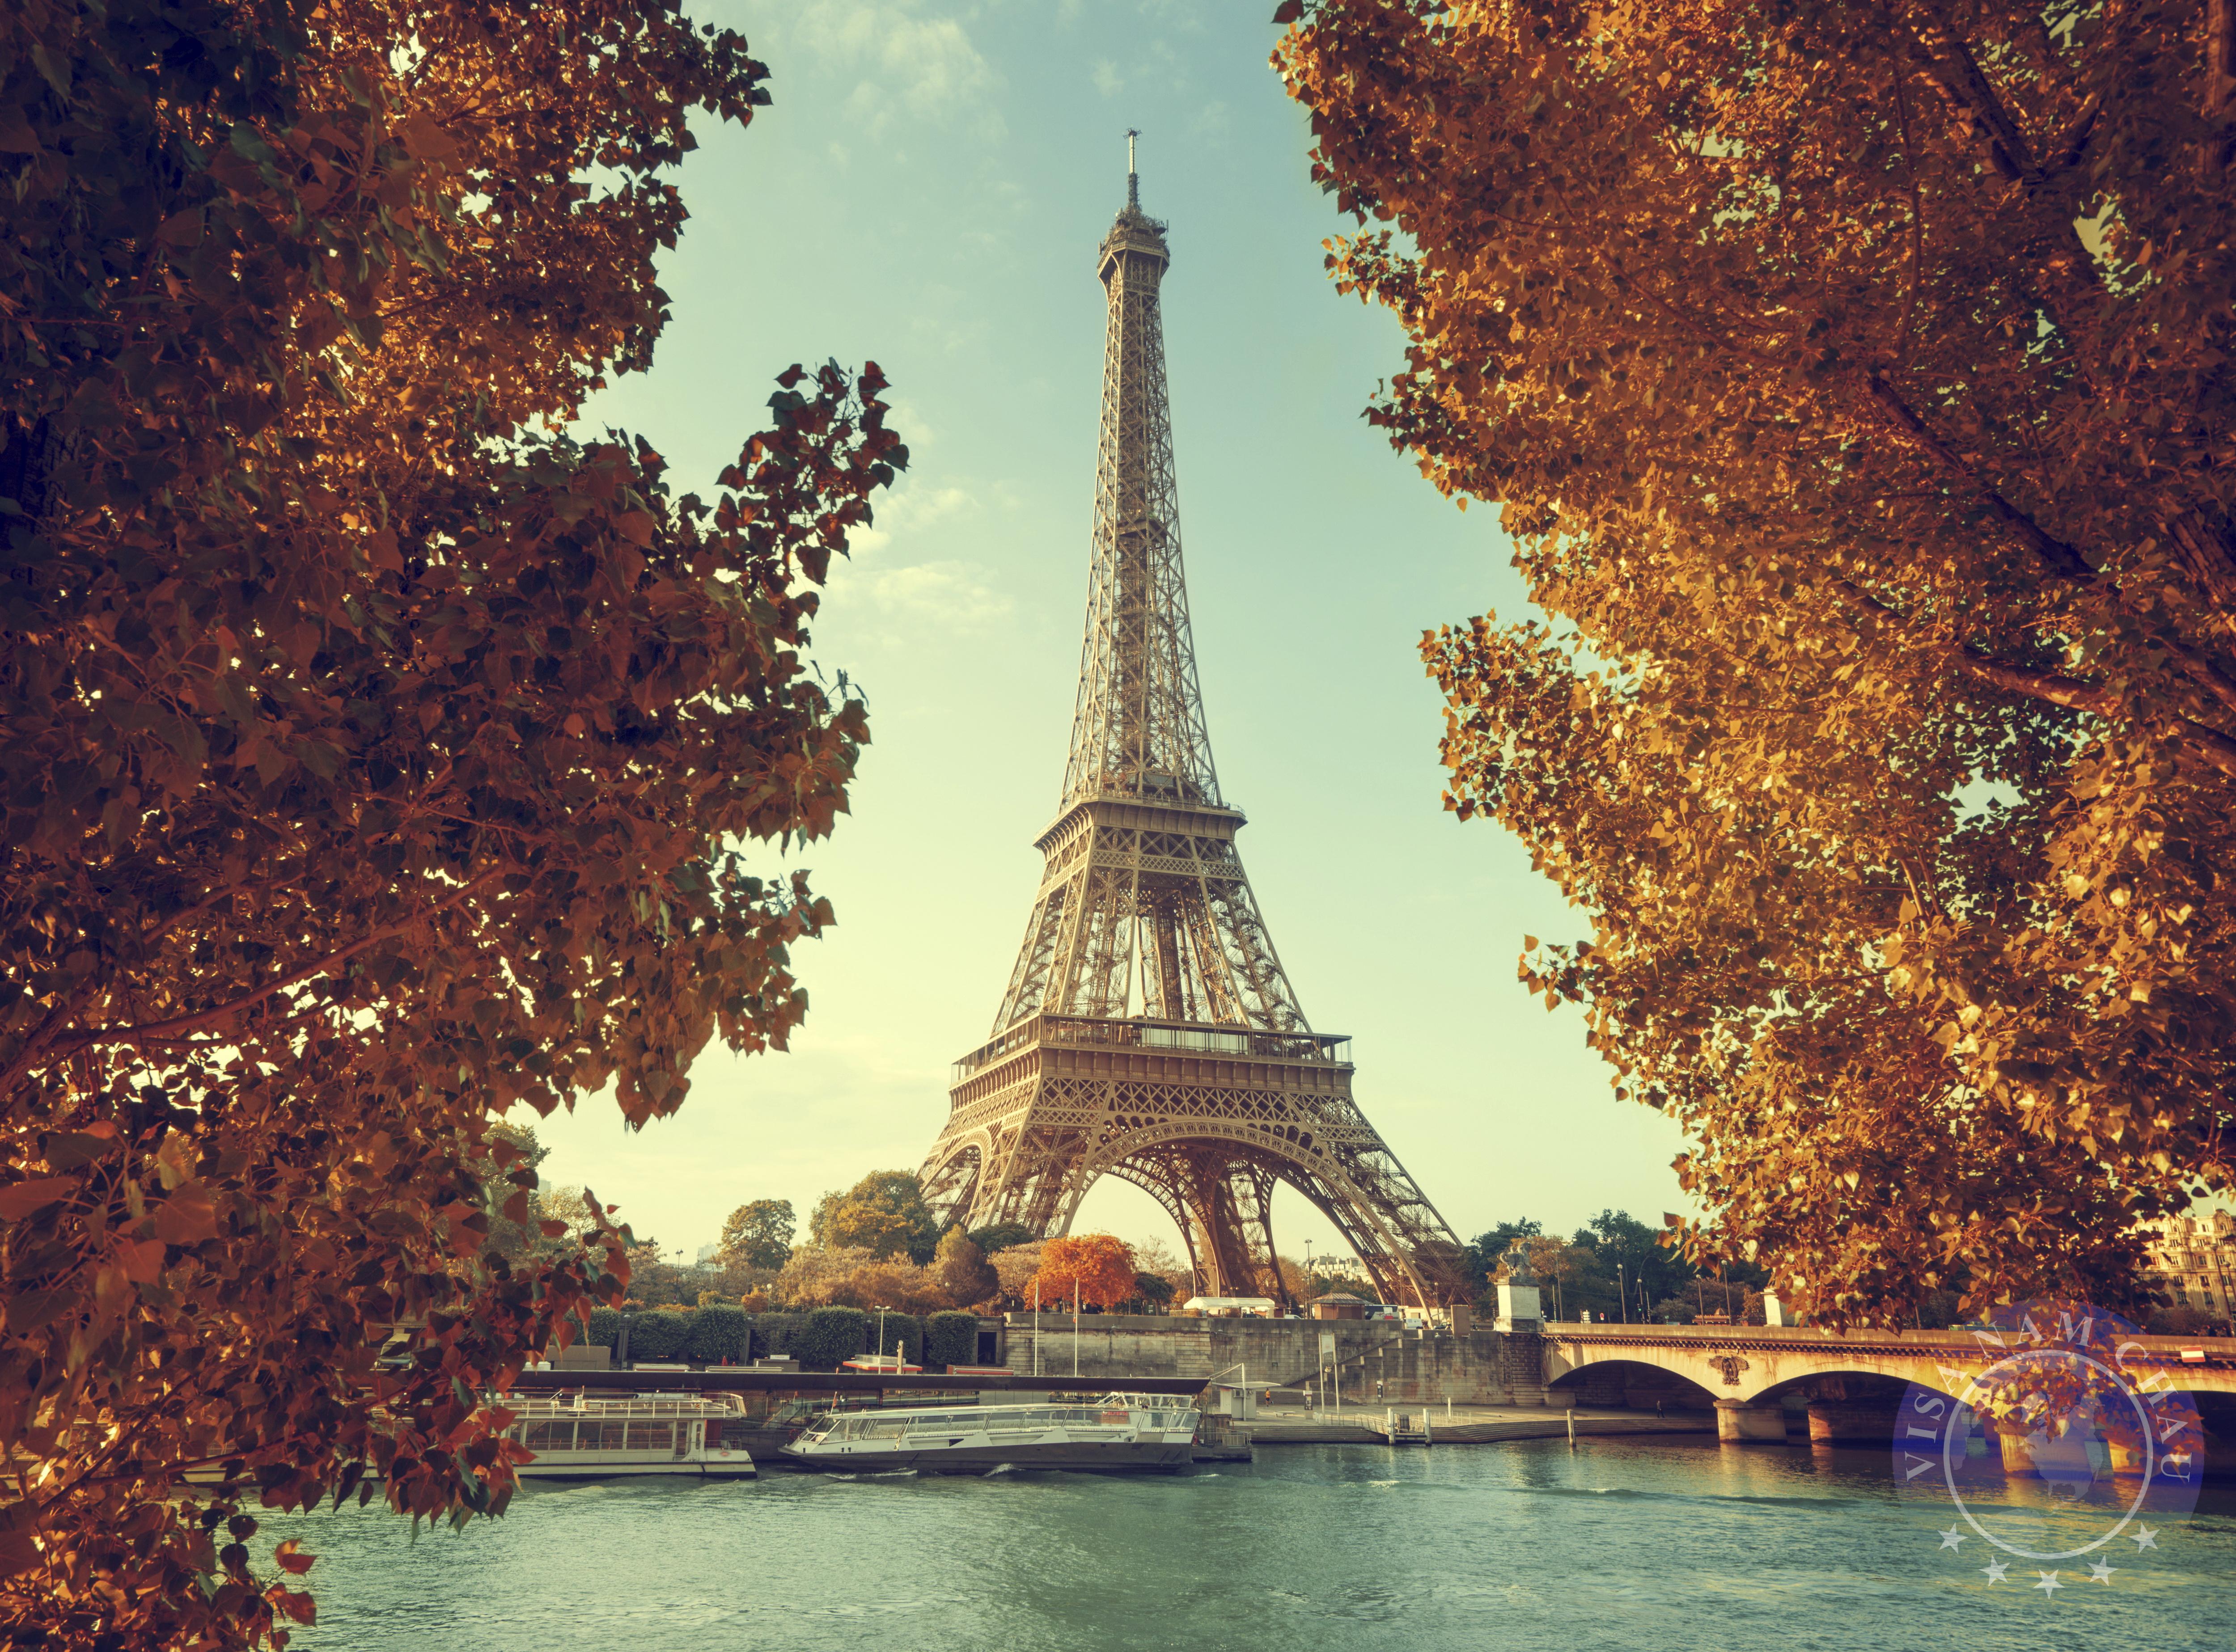 Hồ sơ visa du lịch Pháp